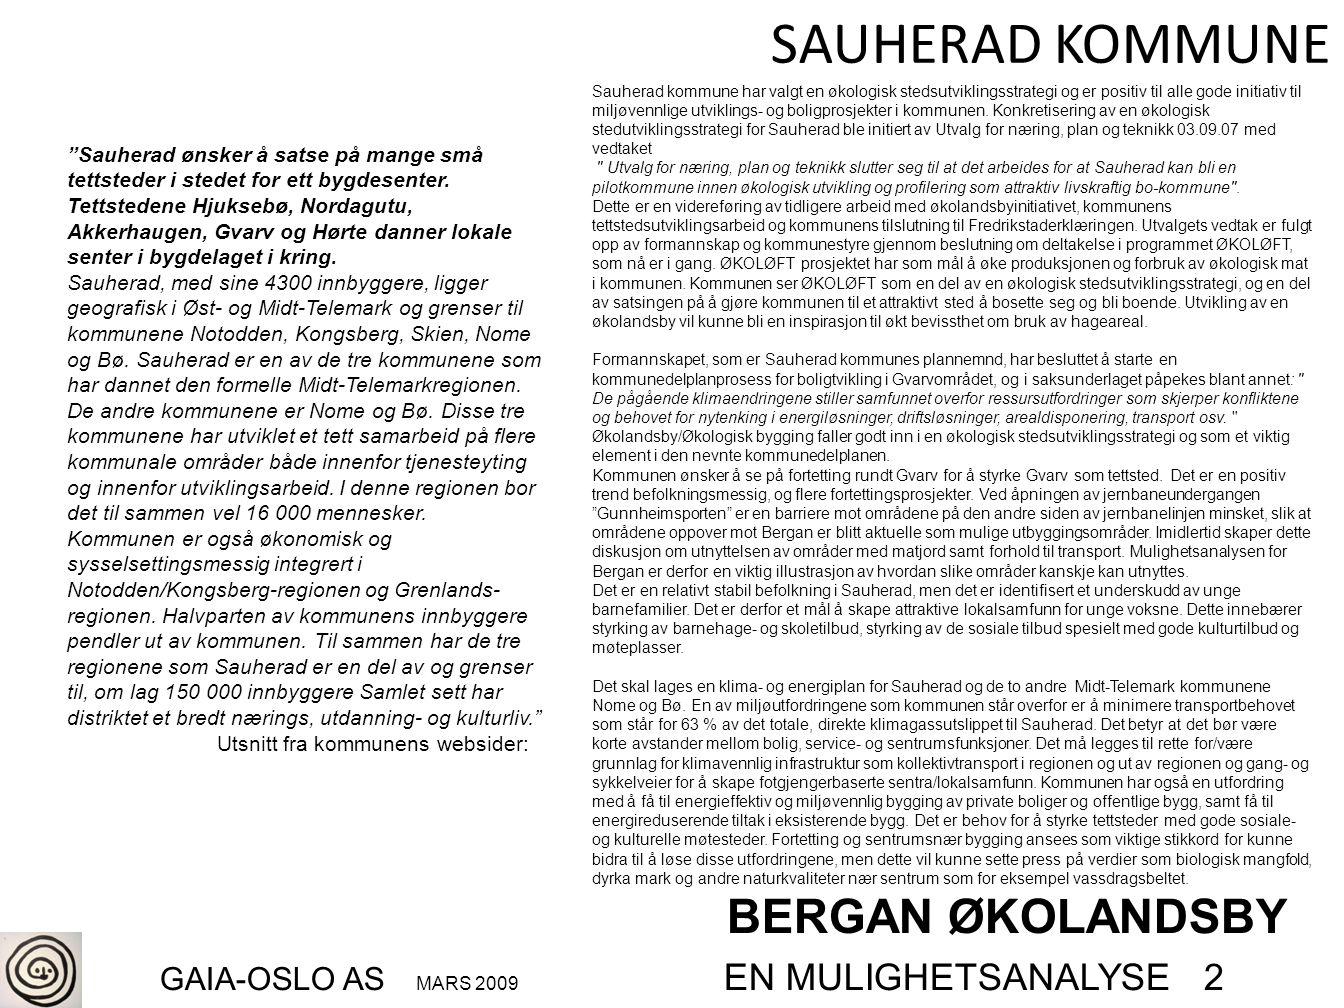 BERGAN ØKOLANDSBY GAIA-OSLO AS MARS 2009 EN MULIGHETSANALYSE 2